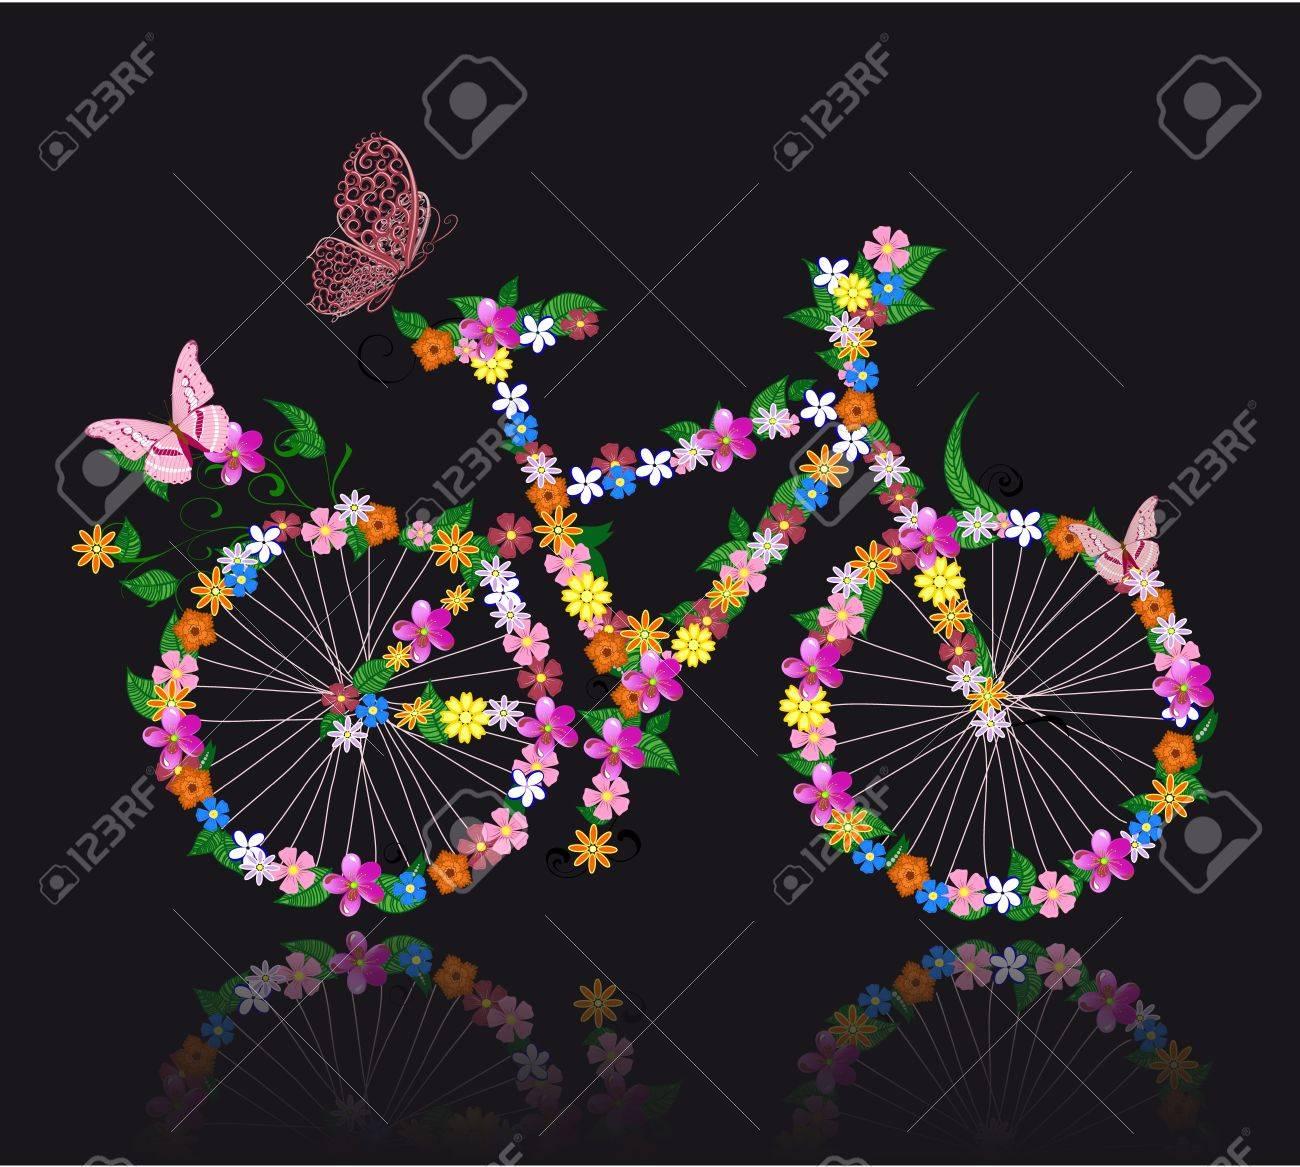 bike with flowers - 10531915